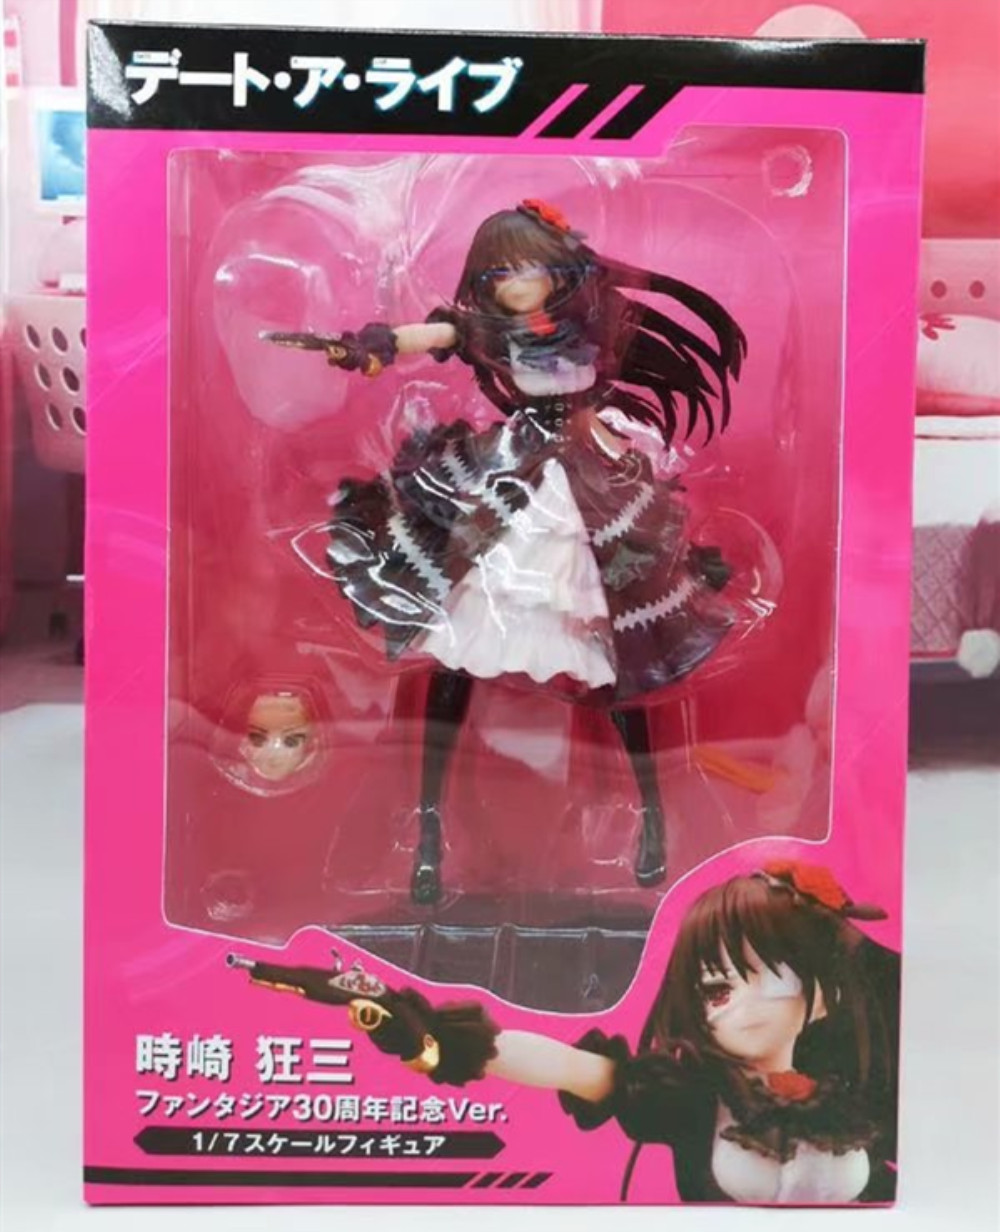 Anime Date A Live Nightmare Tokisaki Kurumi Action Figure Fantasia 30th Anniversary Figurine PVC Model Doll Girl Gift Toys PM 4